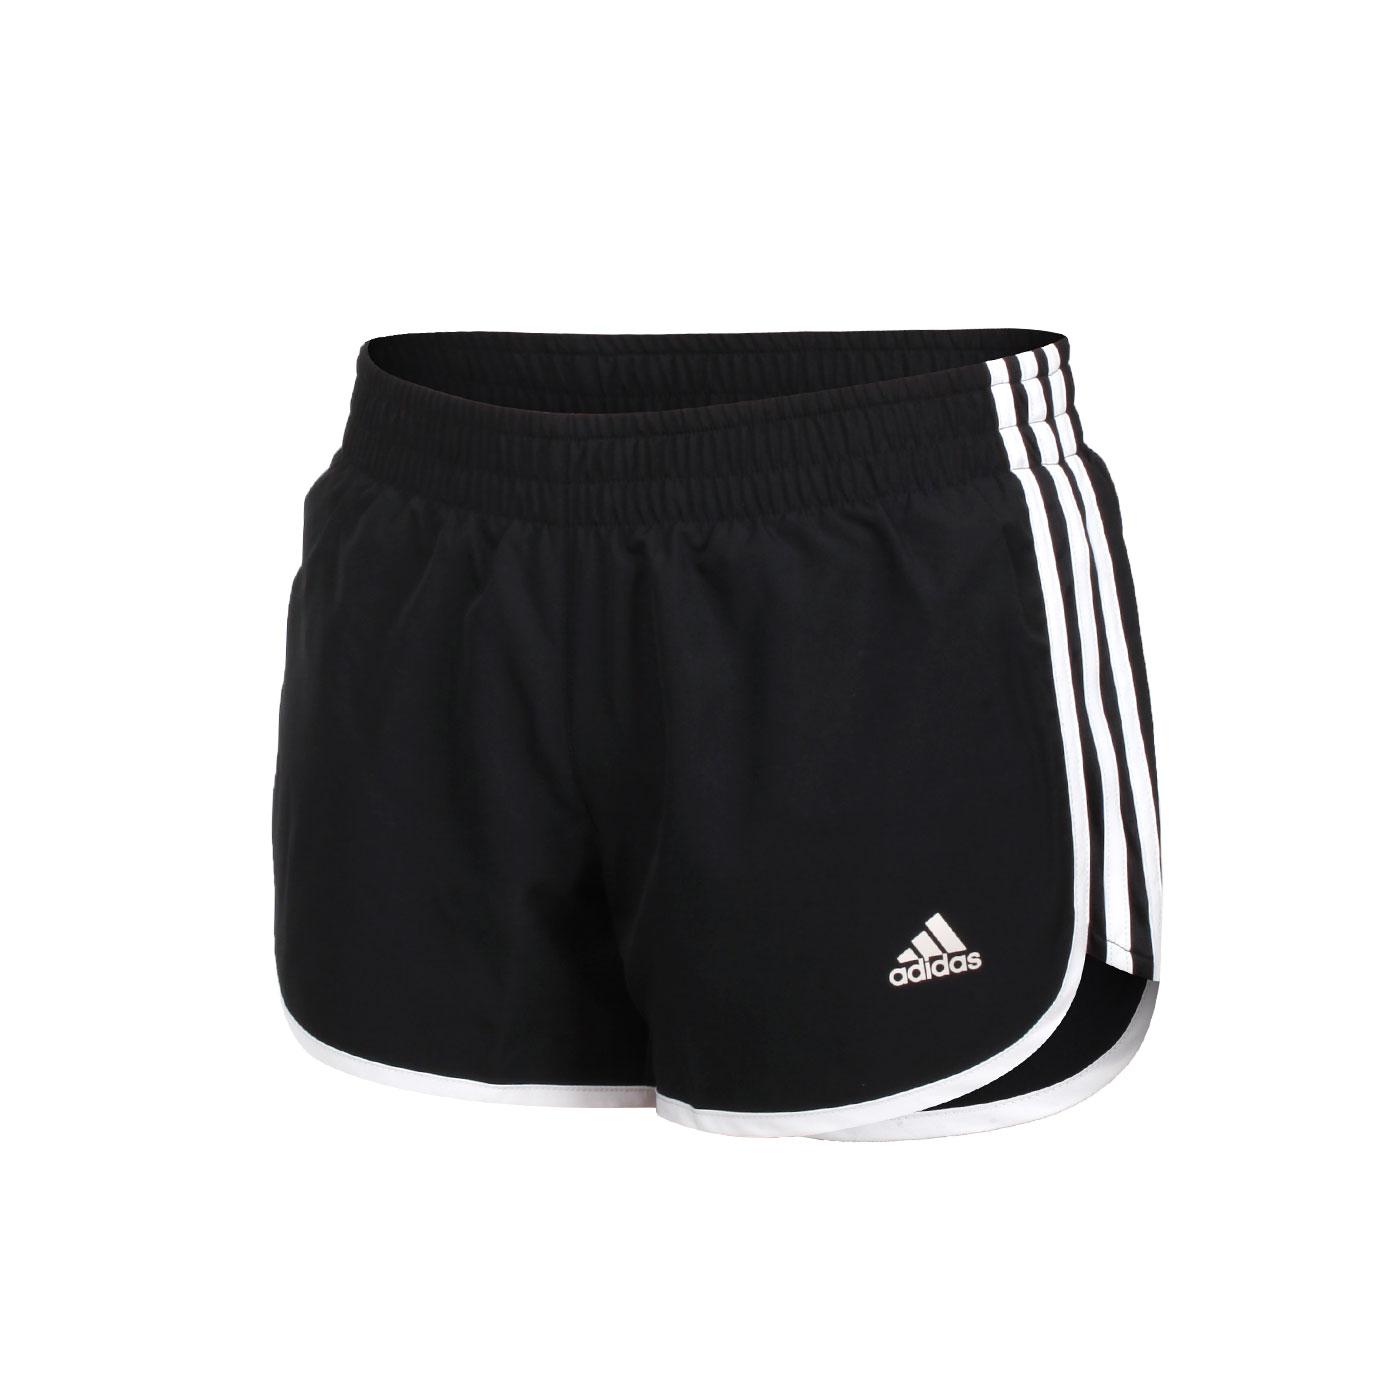 ADIDAS 女款運動短褲 GK5265